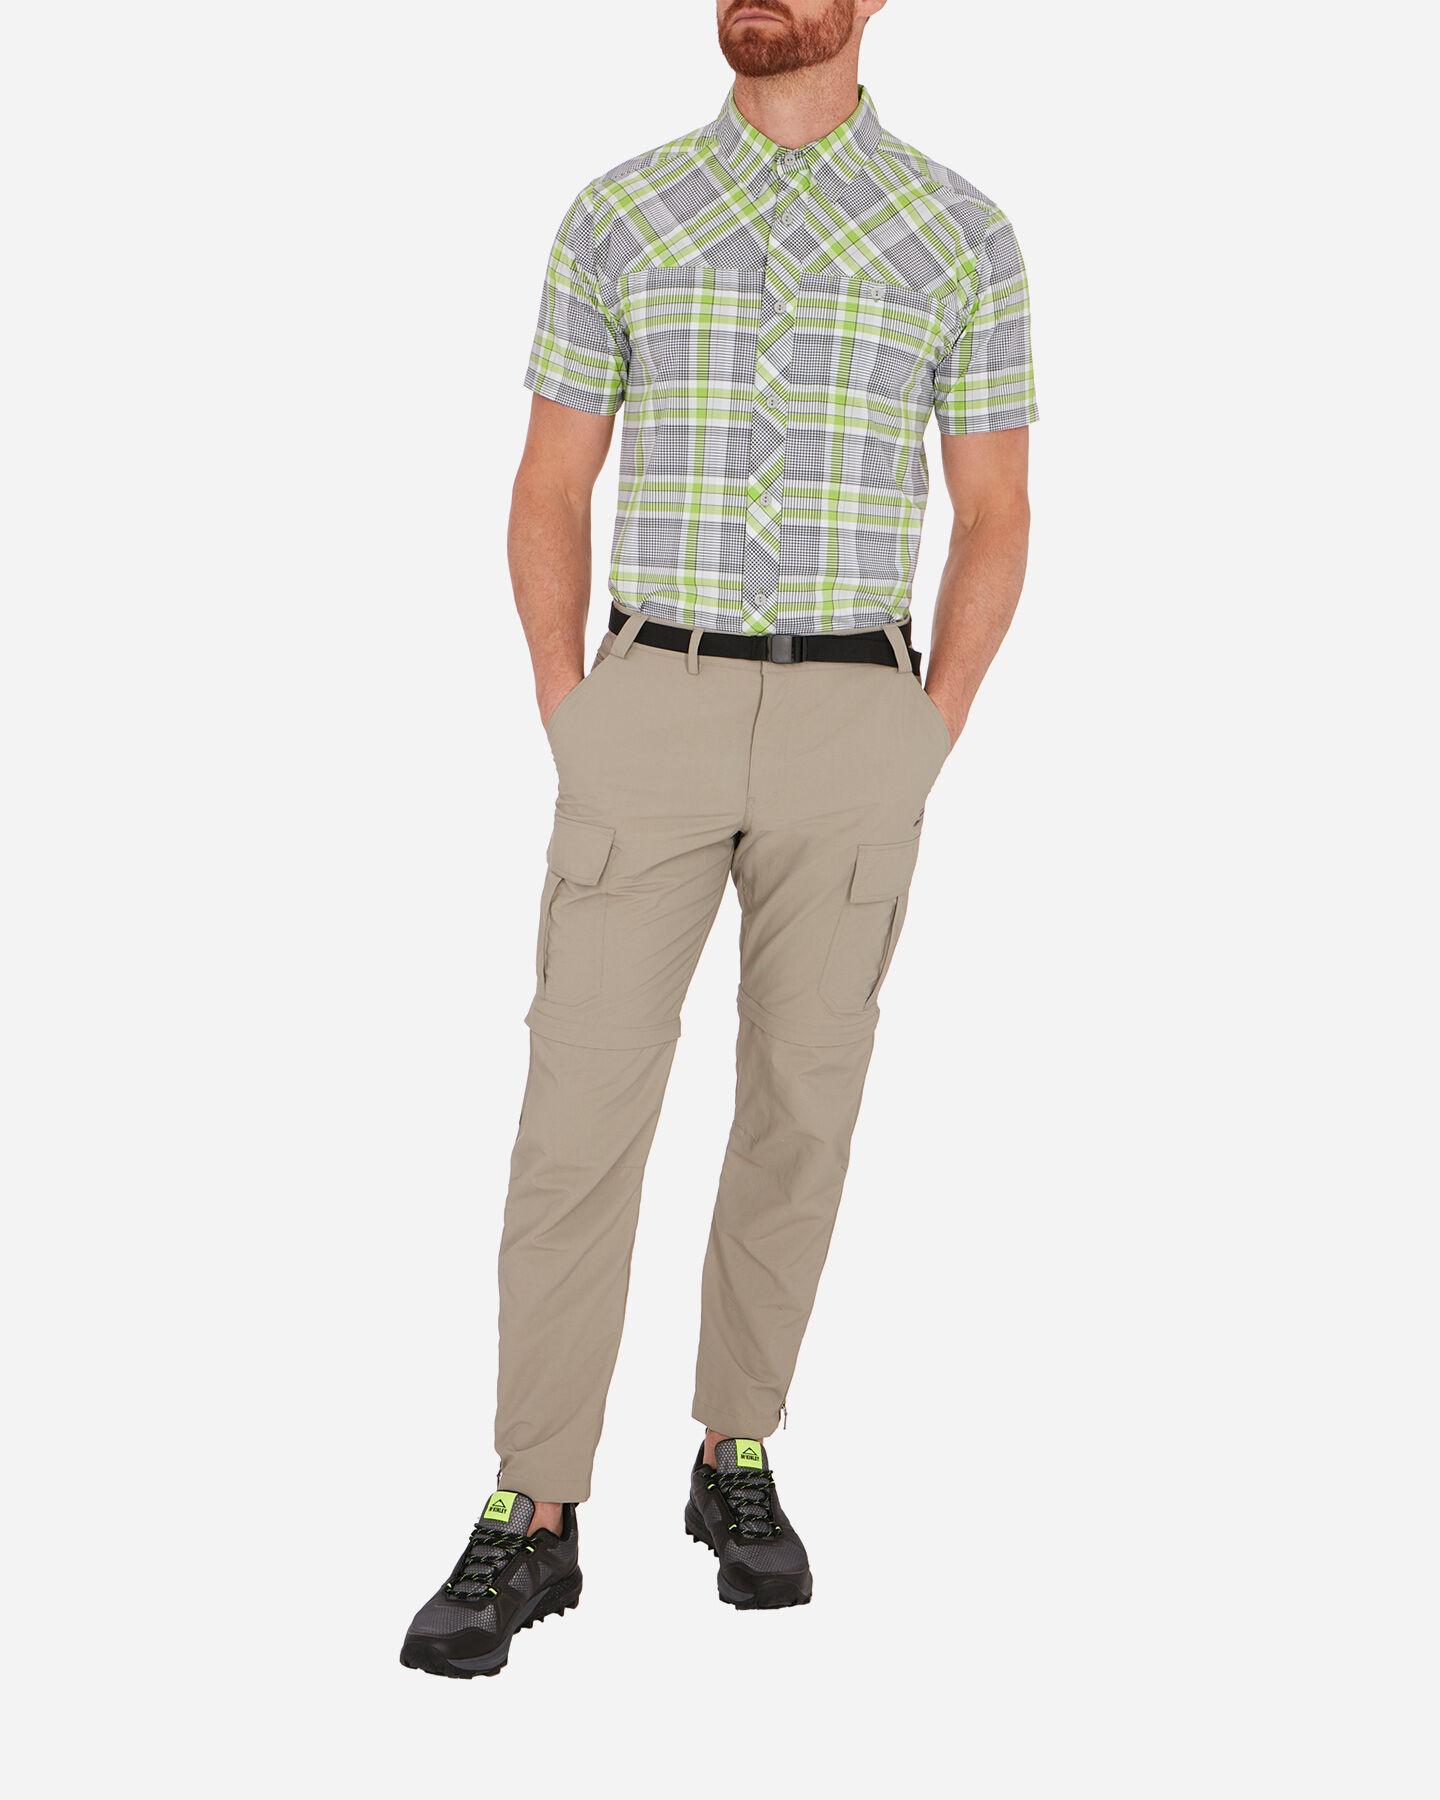 Pantalone outdoor MCKINLEY MAMITE GREY M S2004294 scatto 3